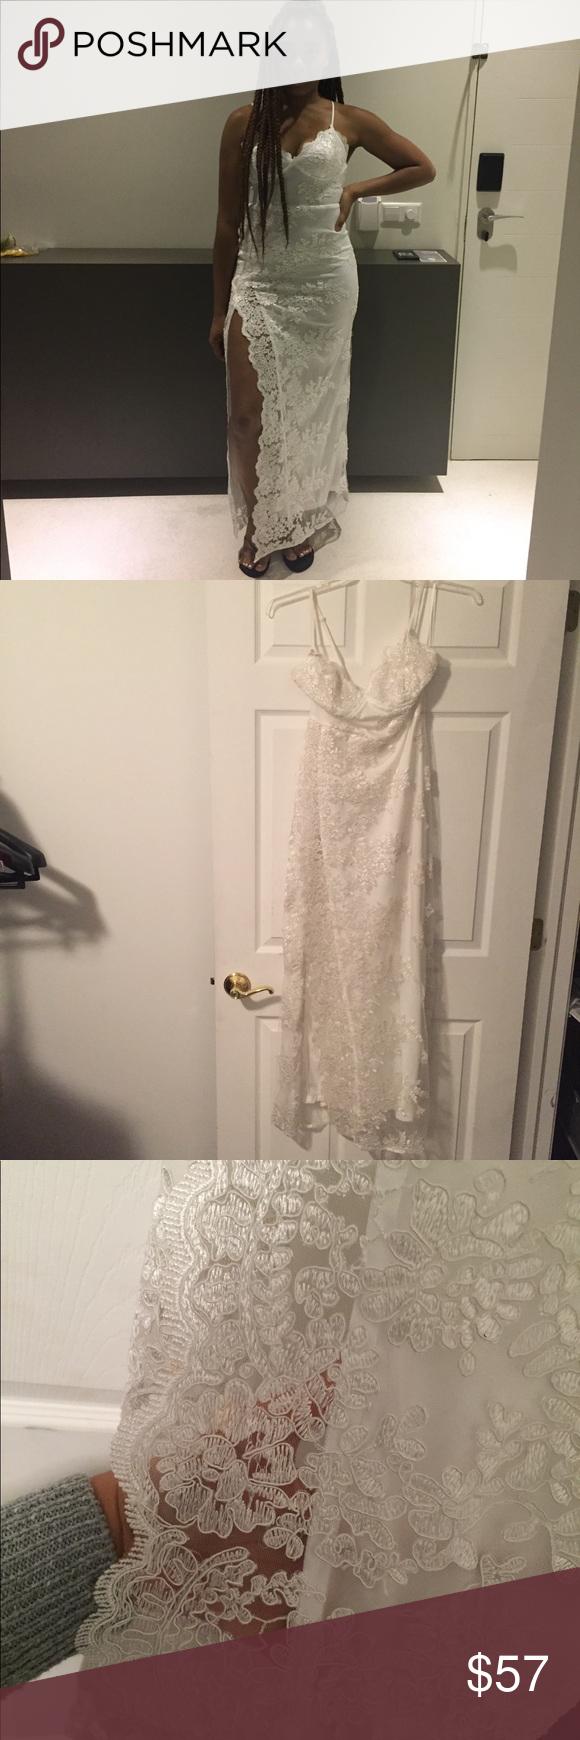 7245a8677e5 A Night In Tokyo Lace Dress - White - Medium A Night In Tokyo Lace Dress -  White - Medium Fashion Nova Dresses Maxi